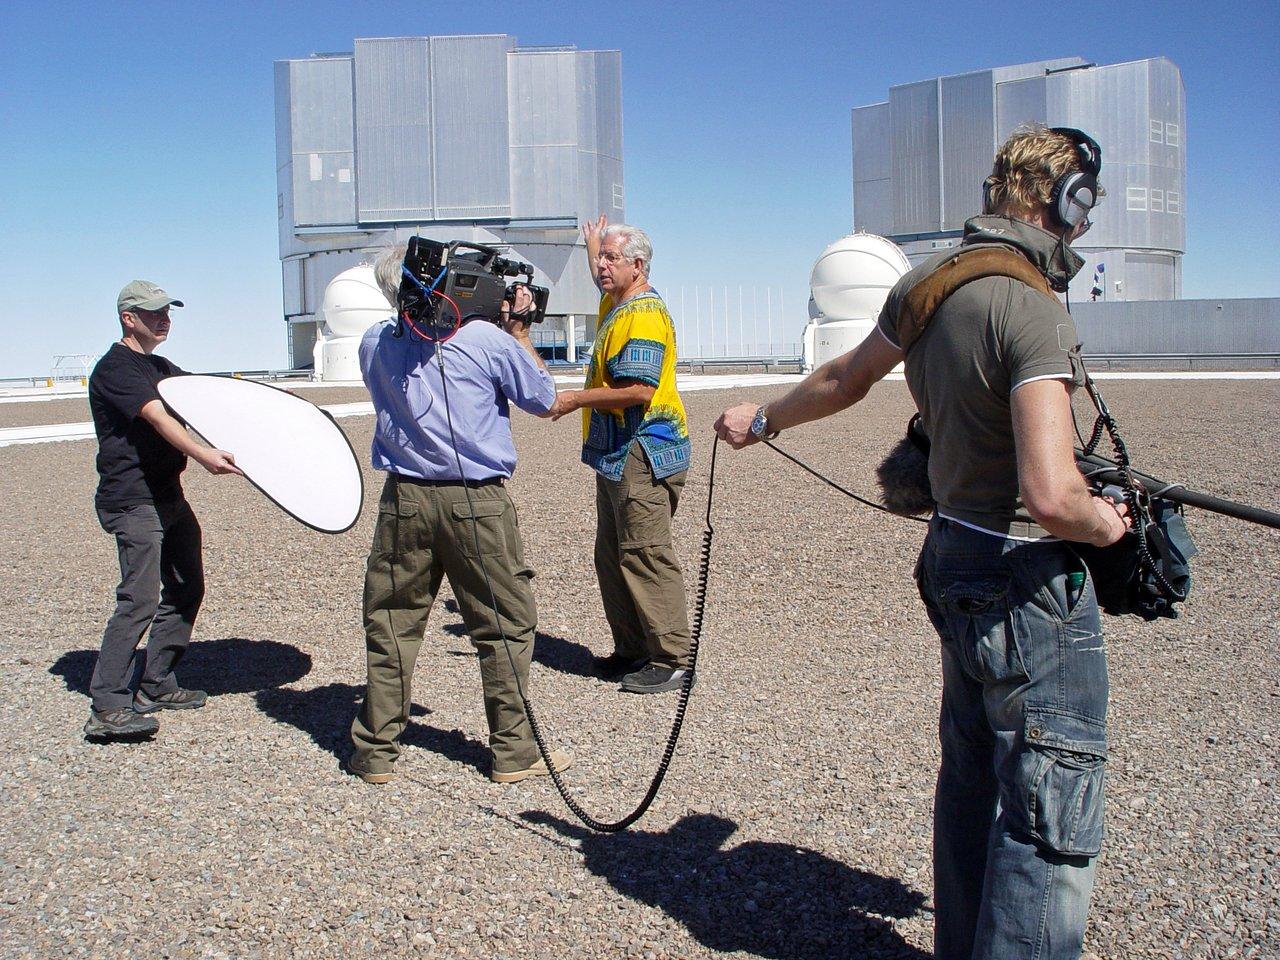 BBC crew filming at Paranal